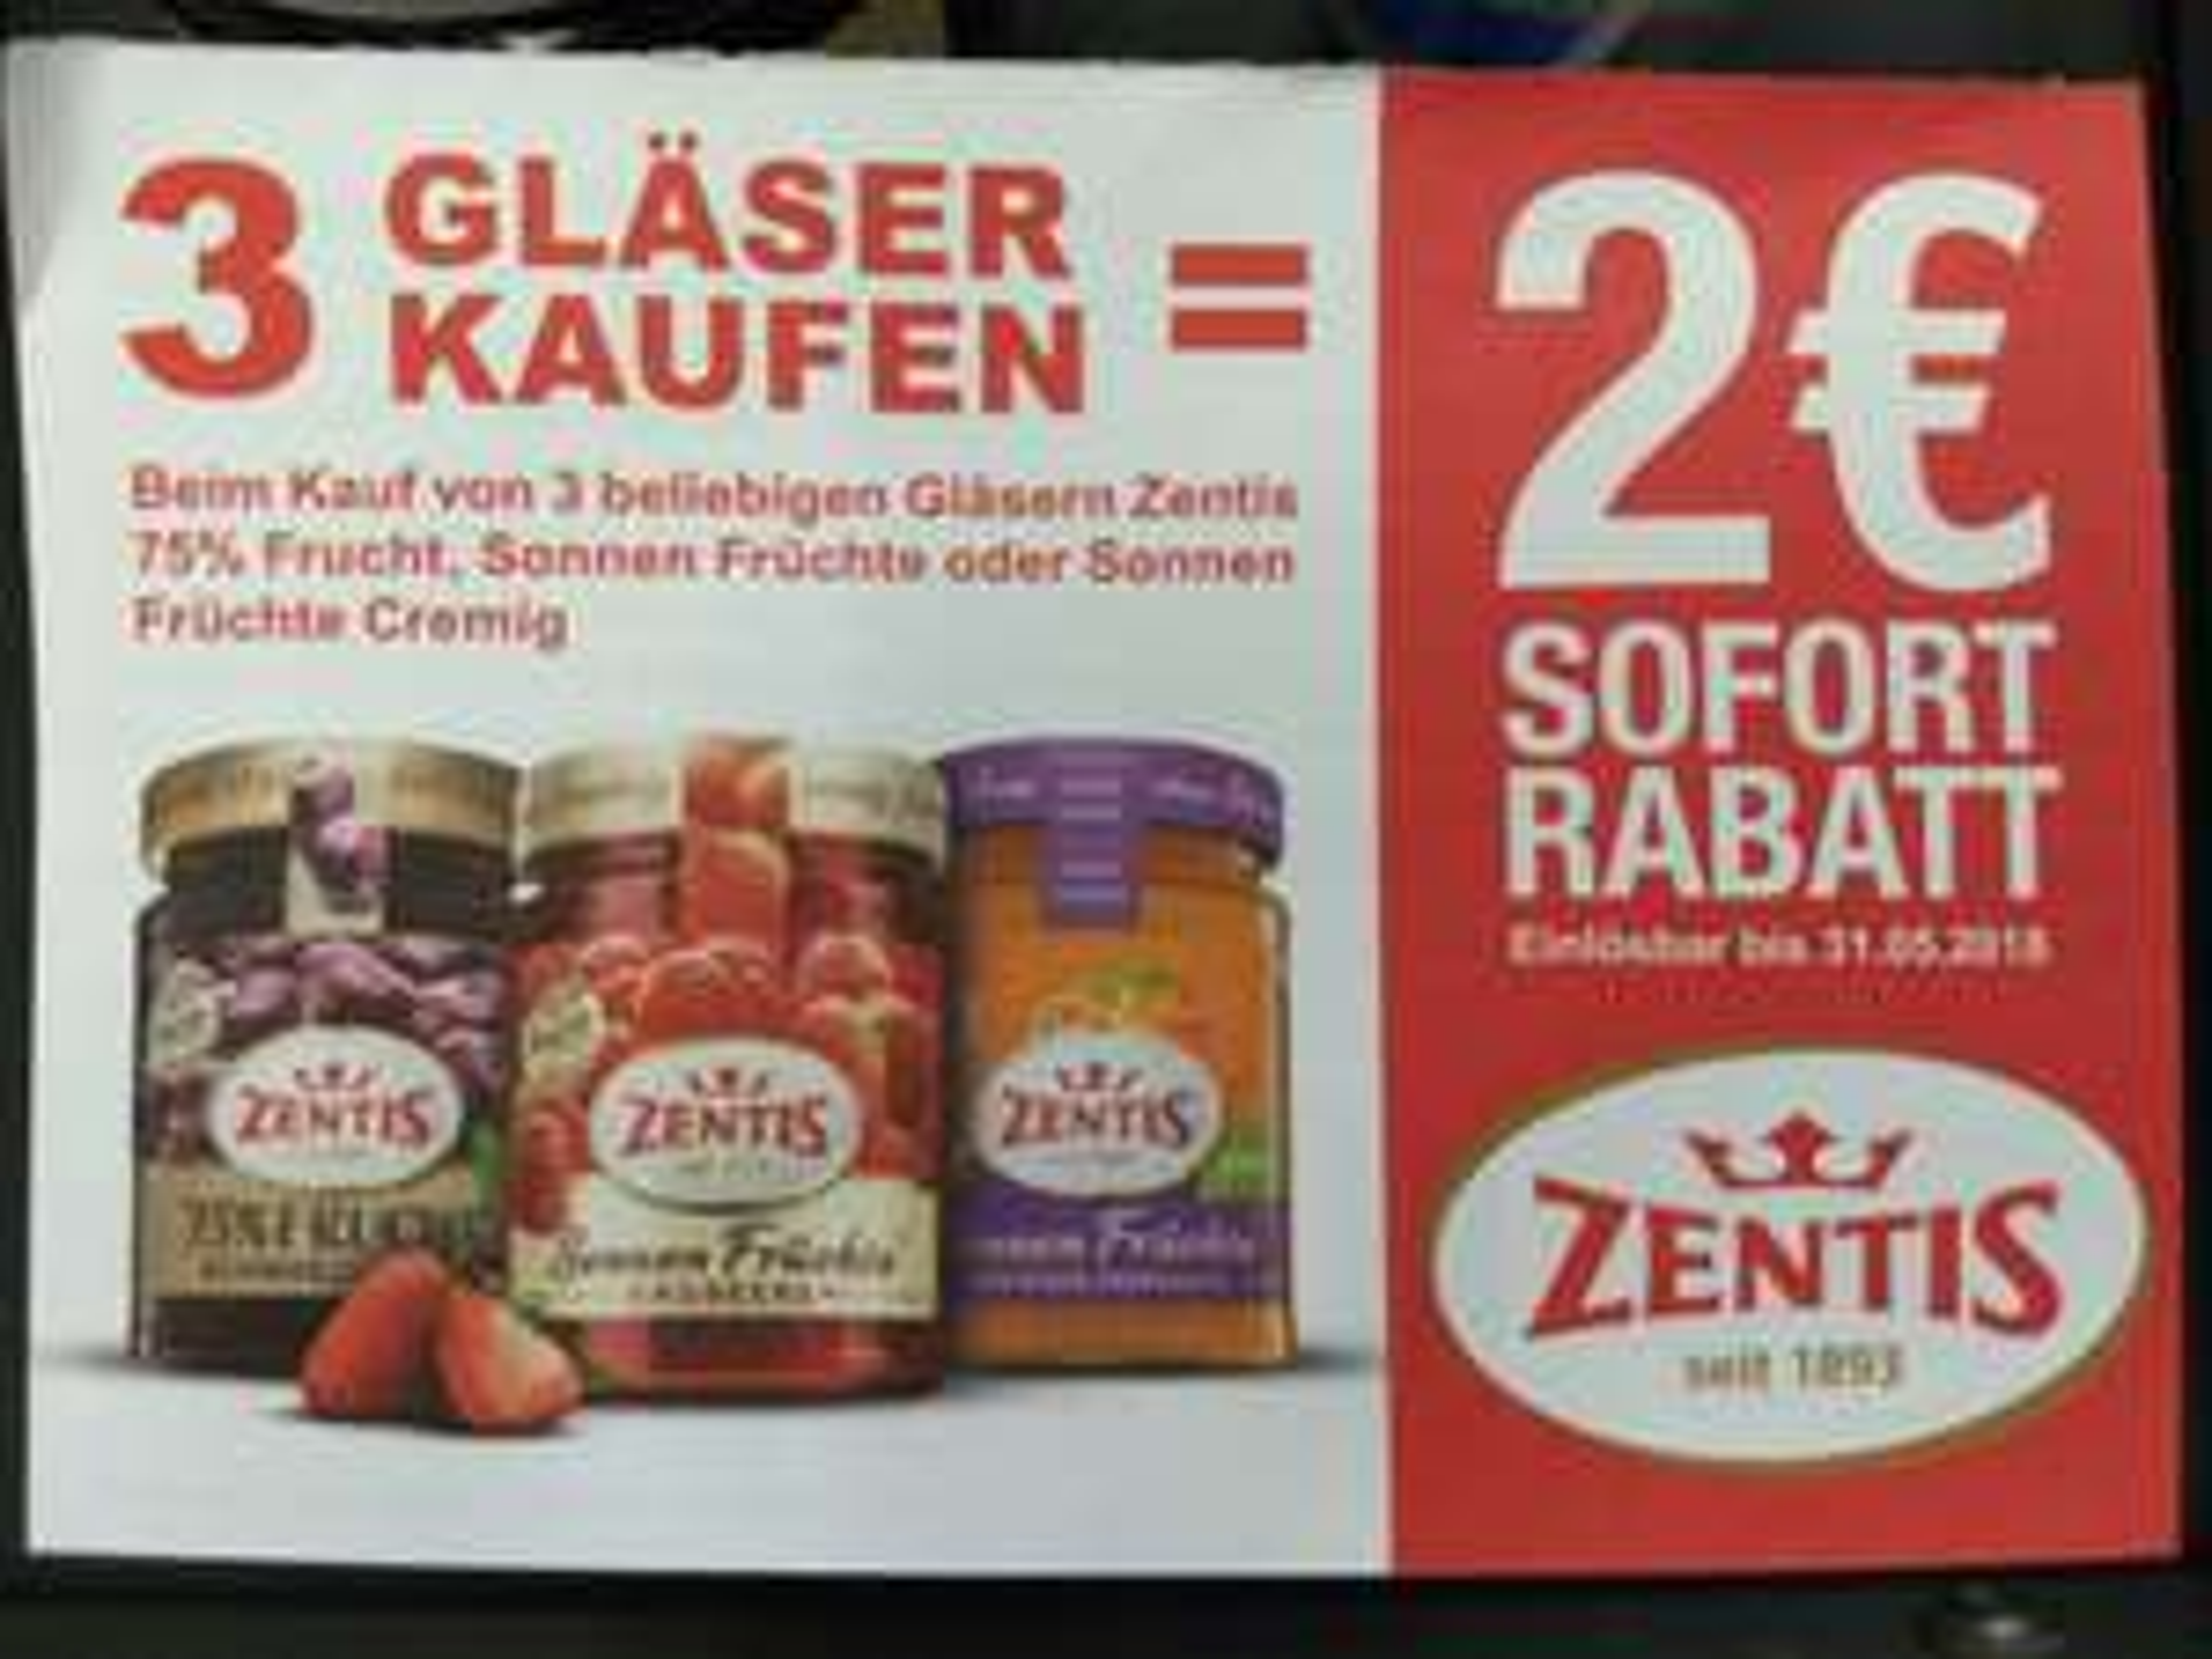 3 Gläser Zentis Marmelade kaufen = 2 € Sofortrabatt